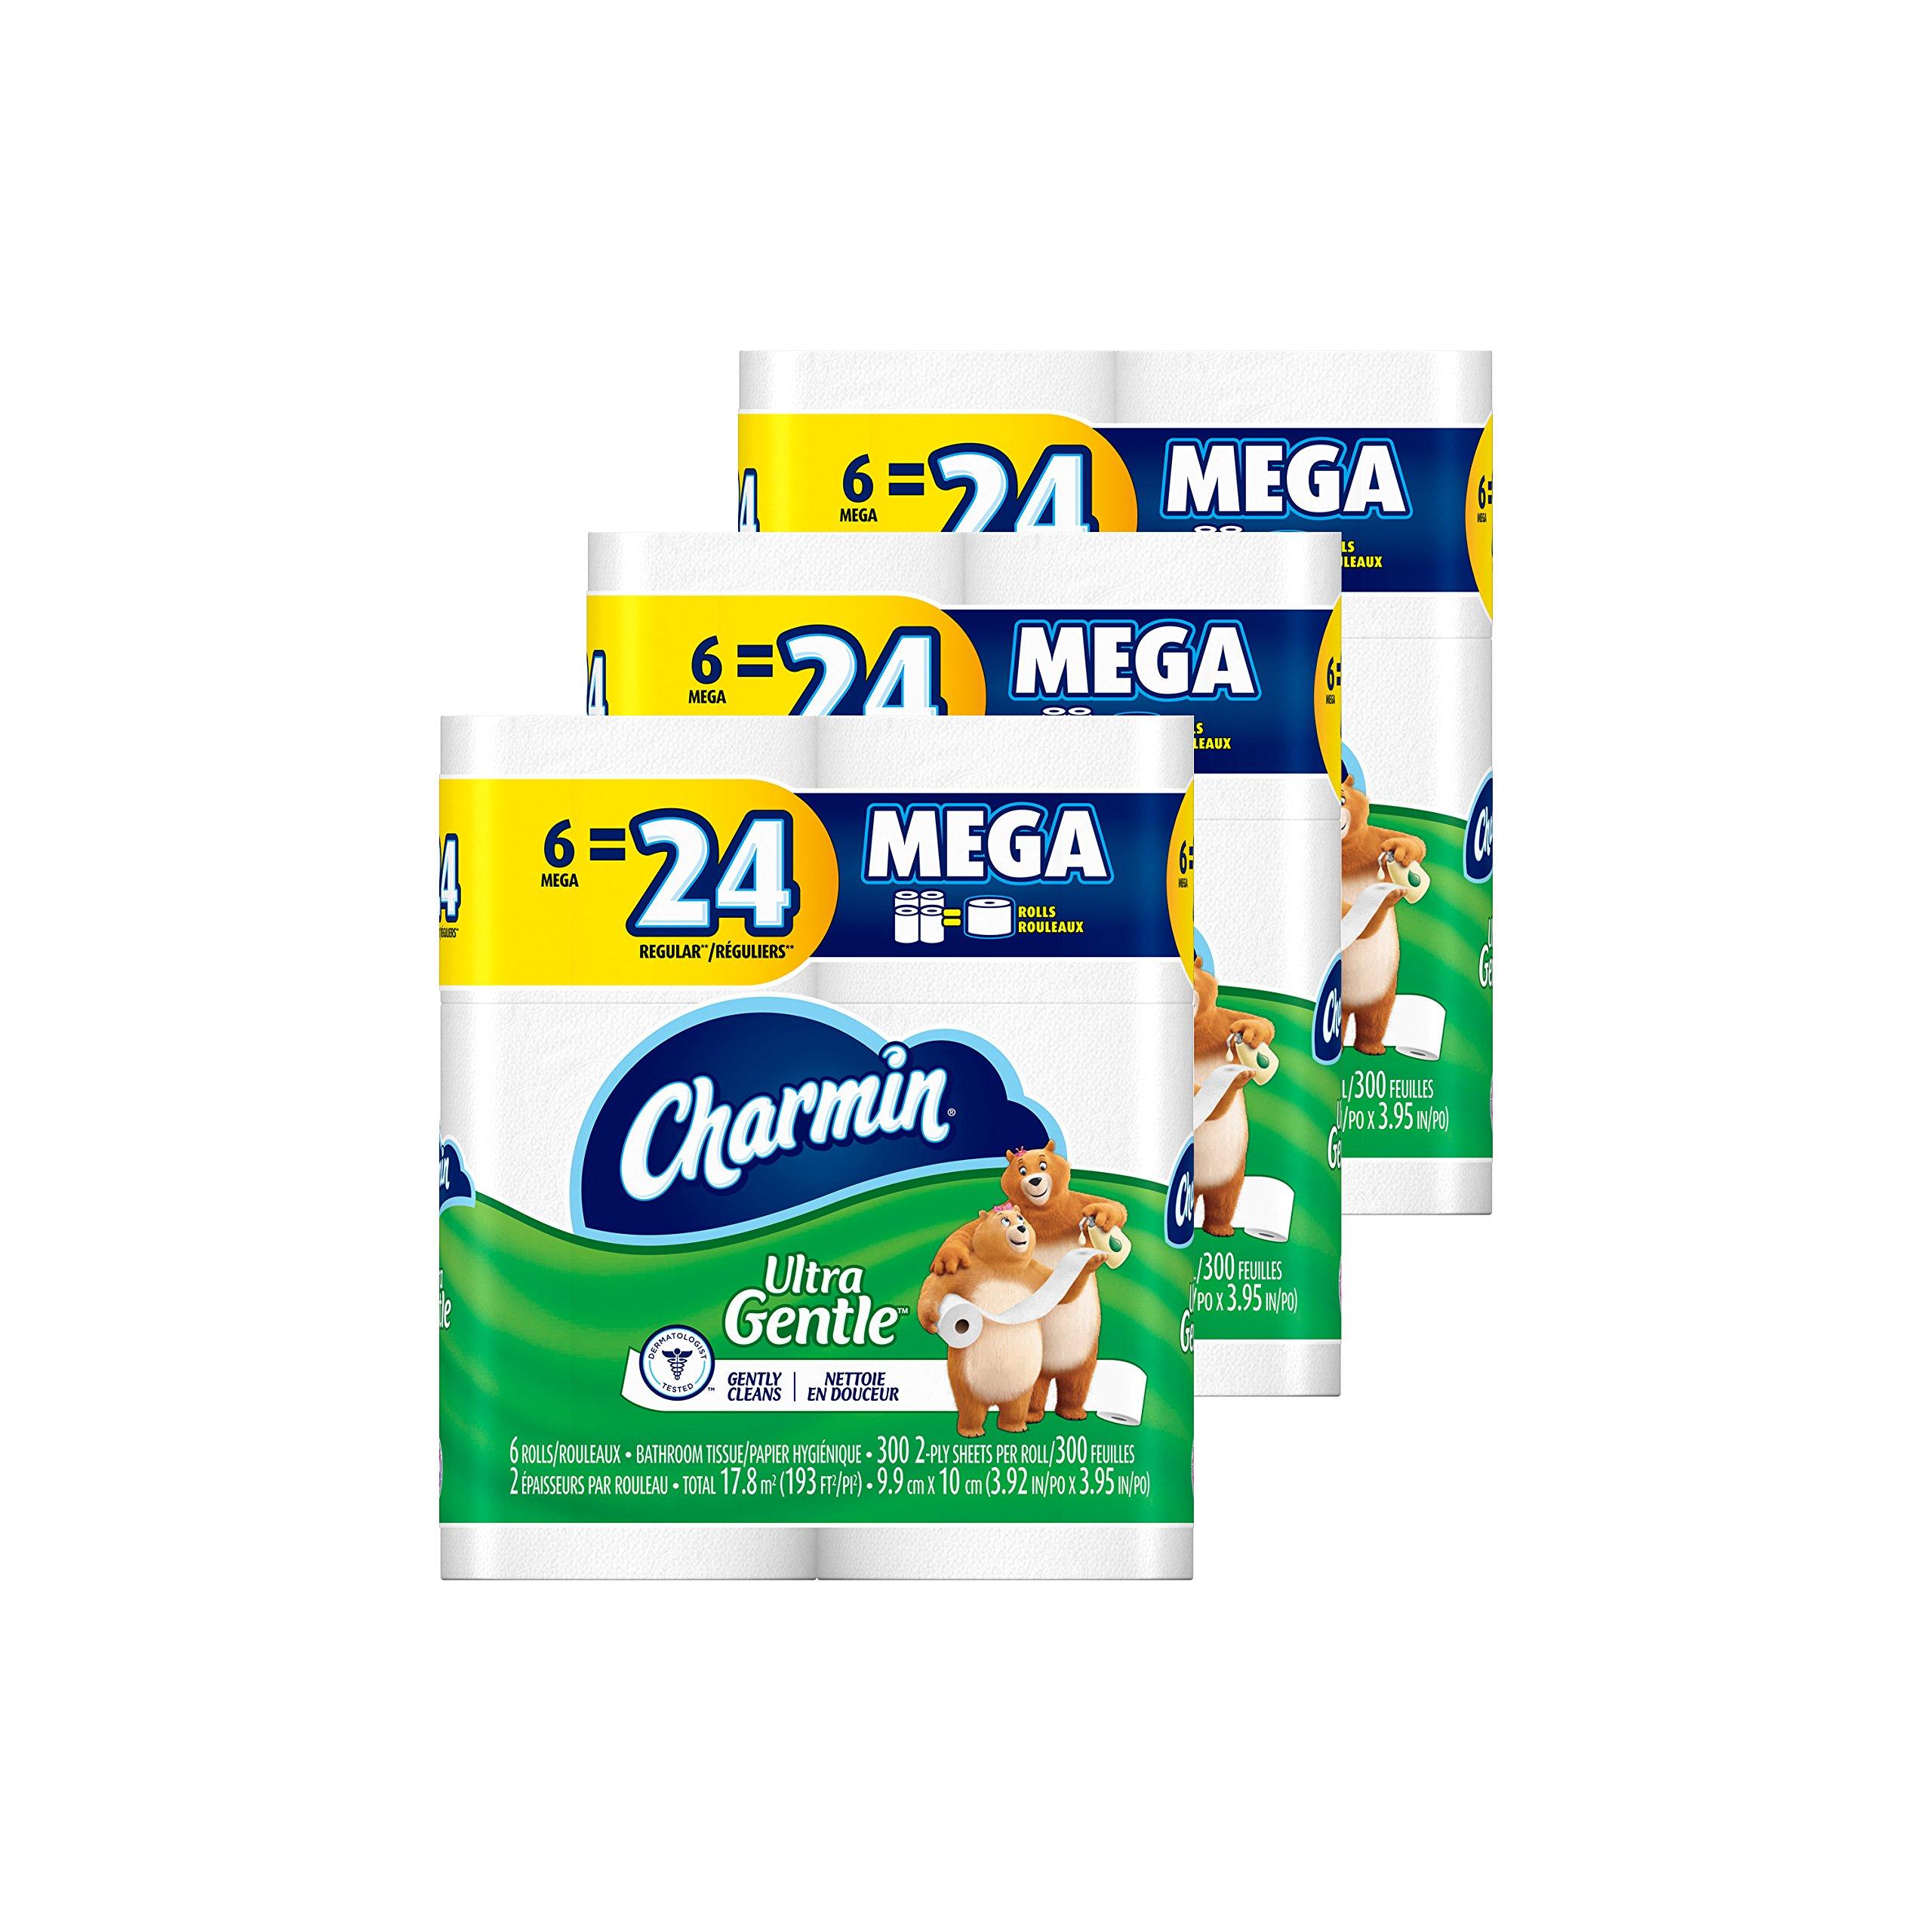 Charmin Ultra Gentle Toilet Paper 6 Mega Rolls (Pack of 3)